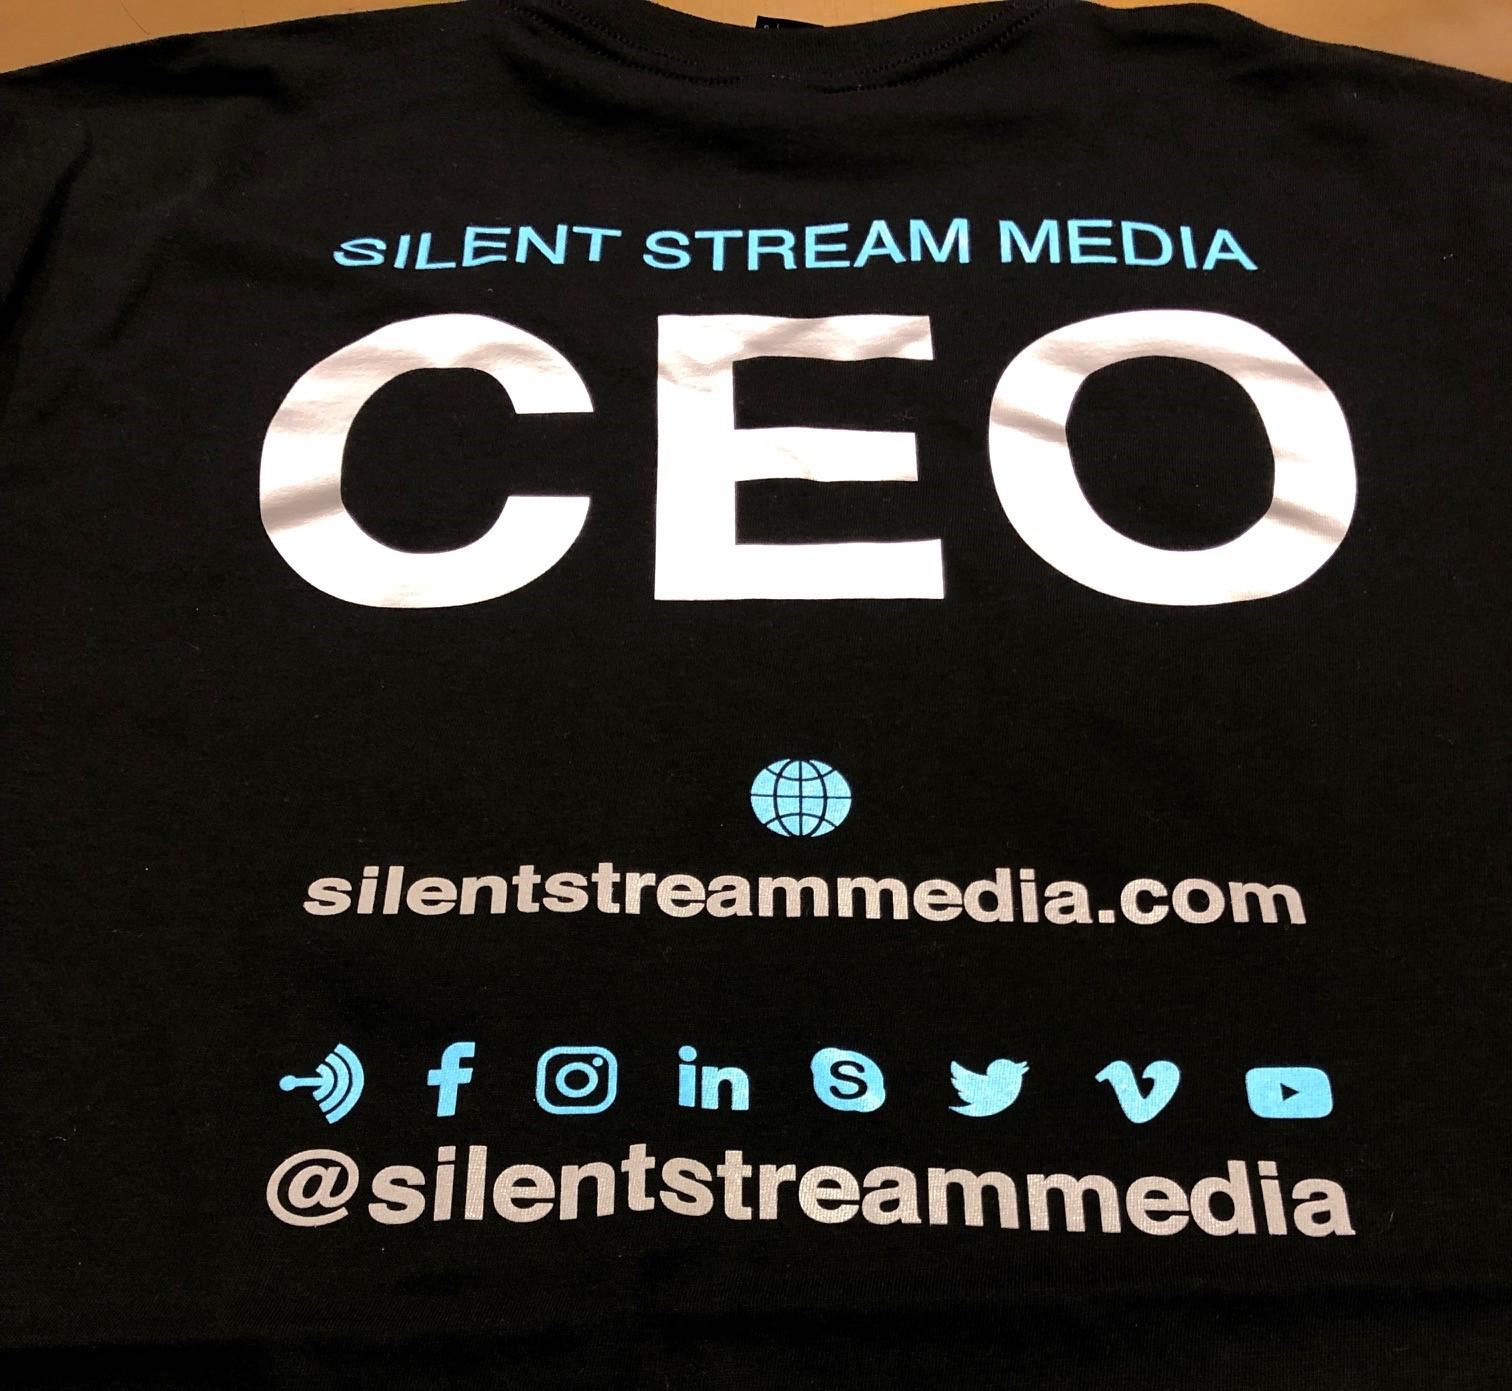 logounltd_laser_etching_embroidery_screen_printing_apparel_uniform_custom_tshirts_t_shirt_kirkland_bellevue_seattle_redmond_woodinville_branded_merchandise_promotional_products_logo_unltd_silent_stream_meadia (2).jpg